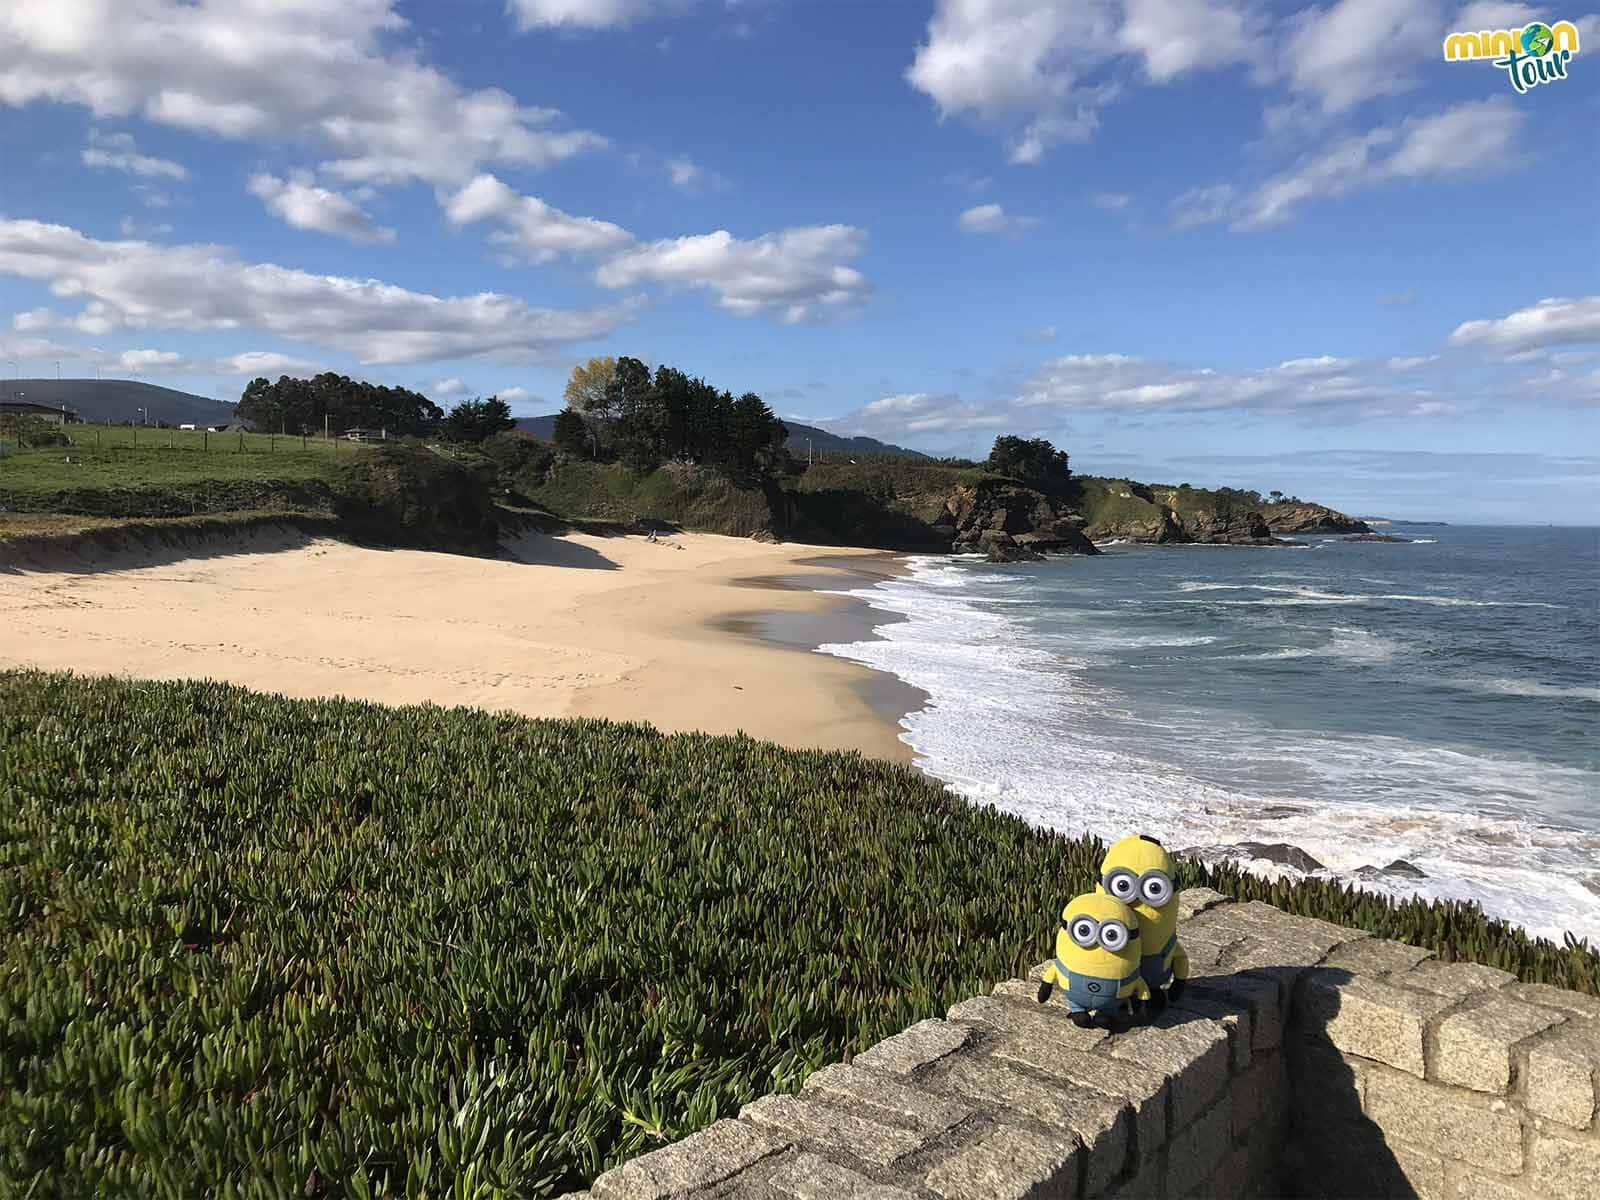 Minions de ruta por la costa de Lugo